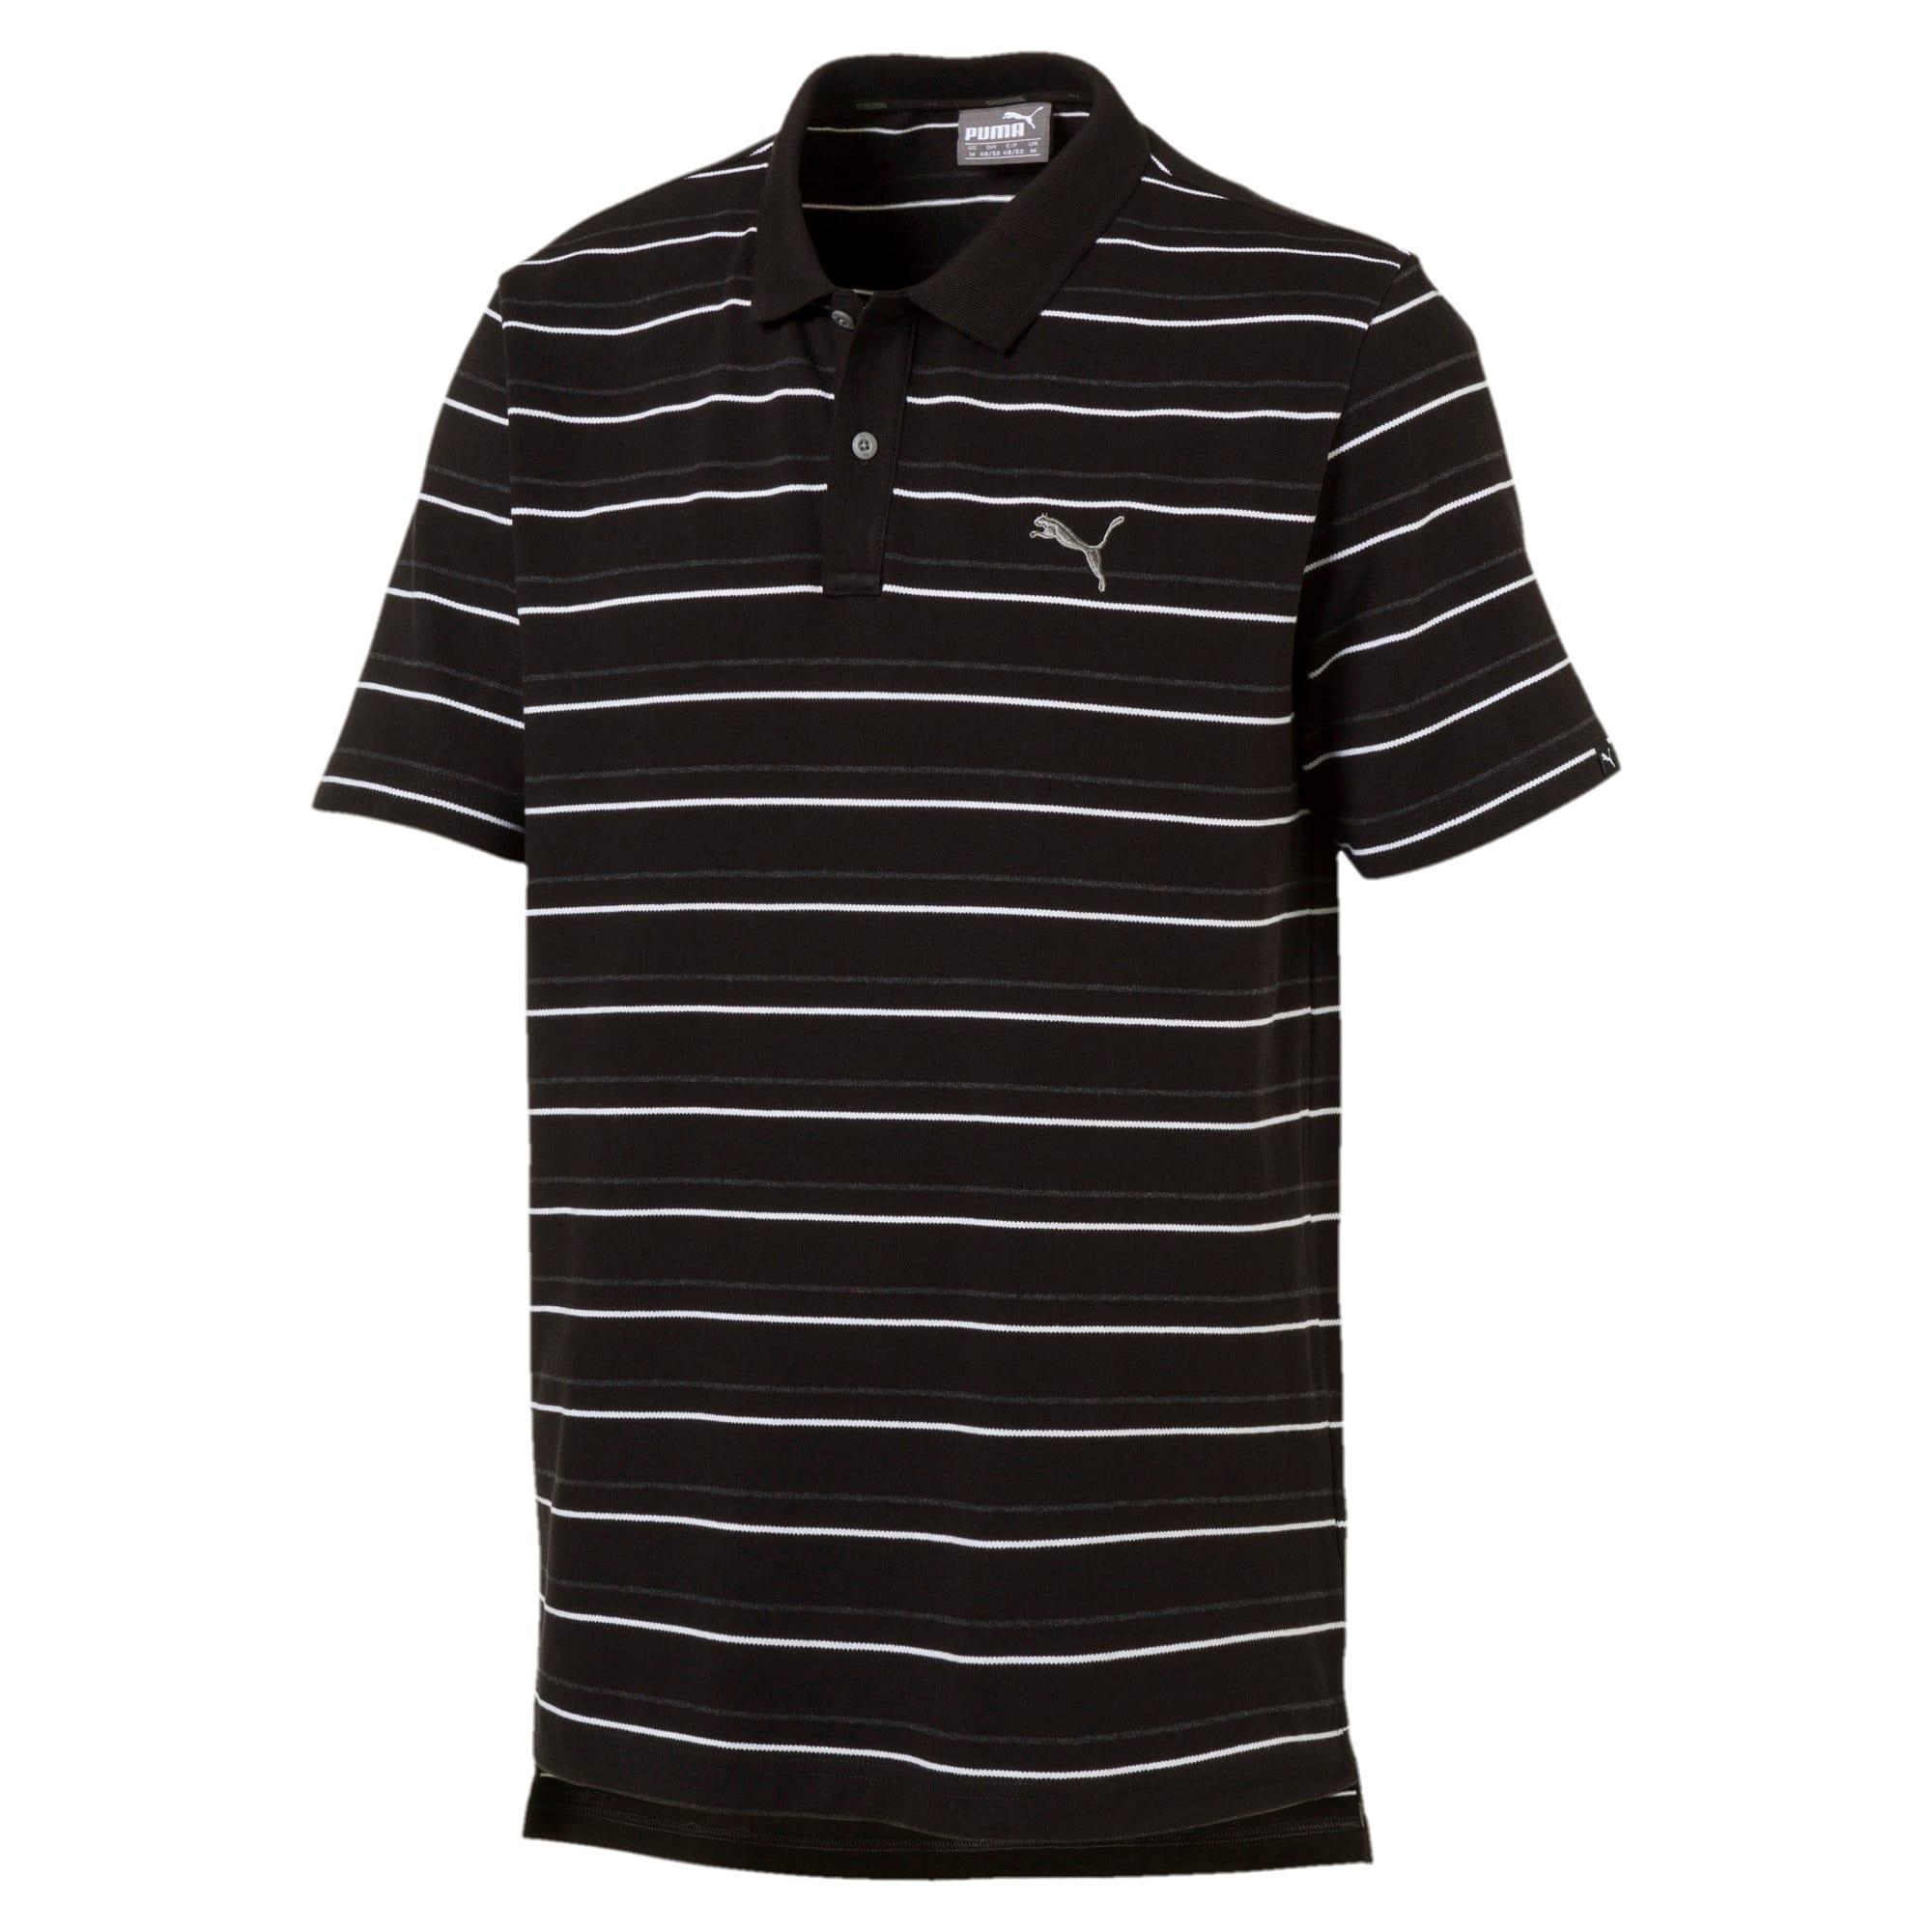 Thumbnail 4 of Sports Stripe Pique Polo, Cotton Black, medium-IND